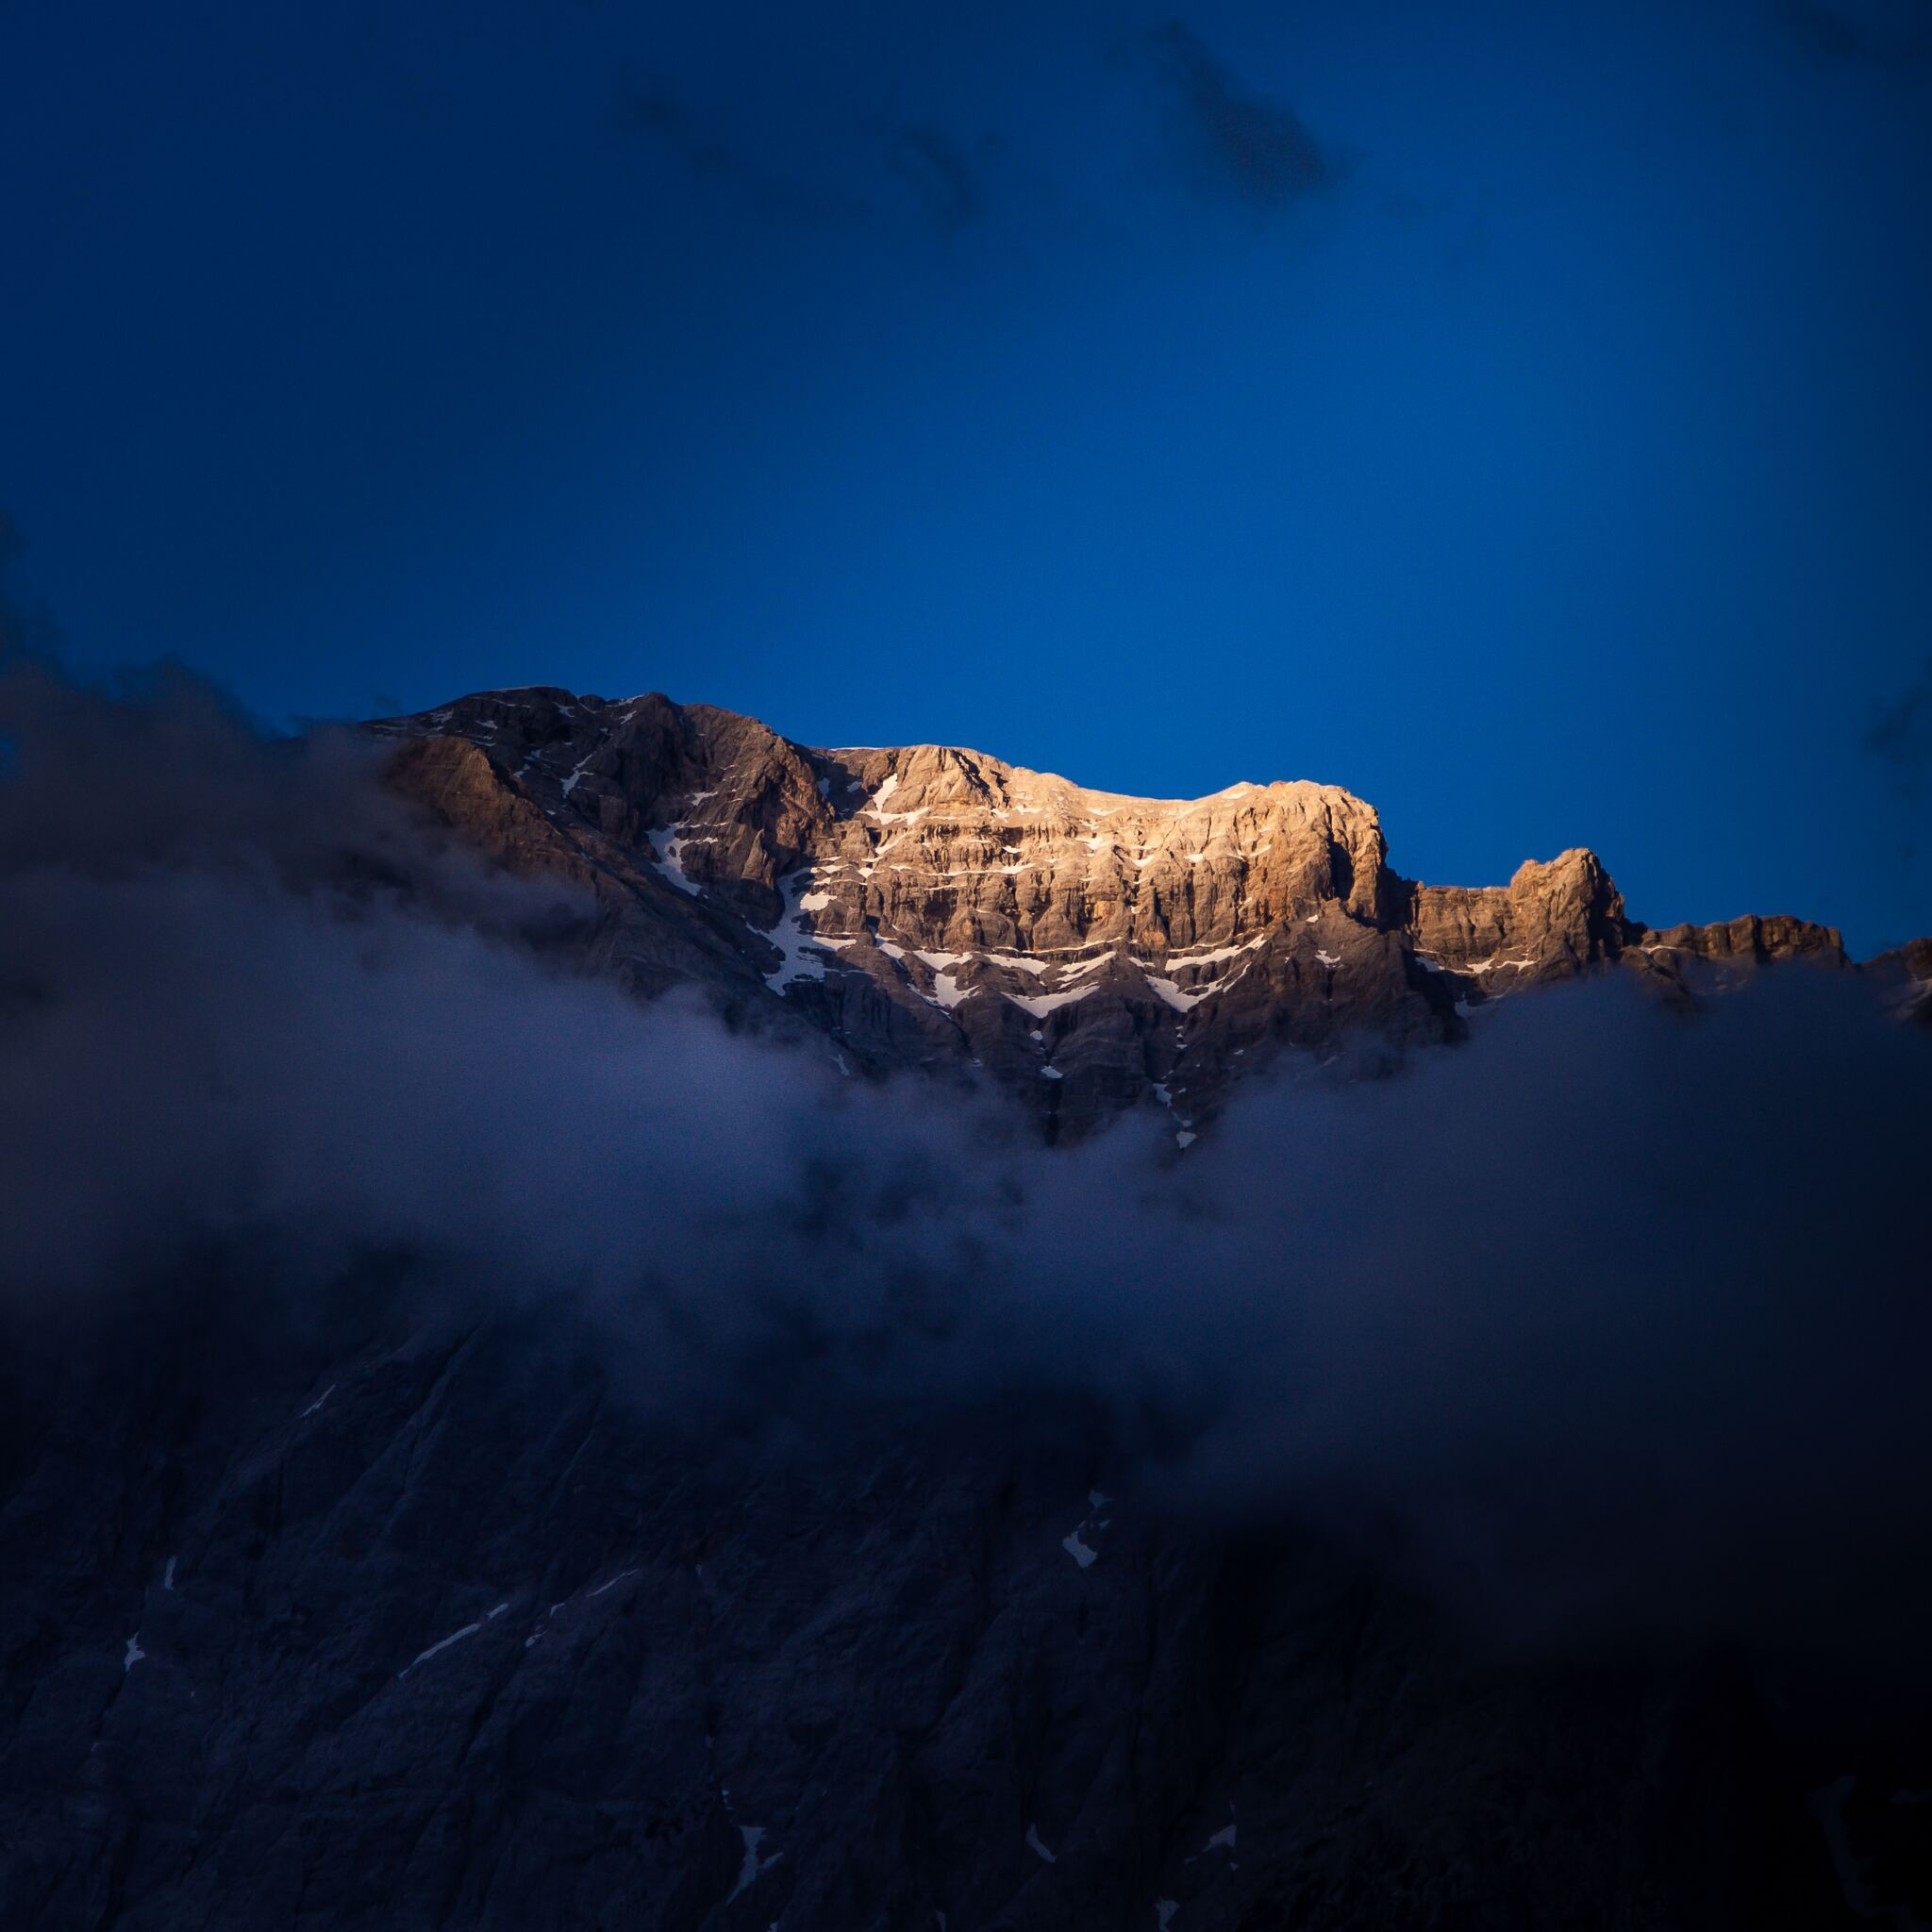 2048x2048 Alp Mountains Ipad Air Hd 4k Wallpapers Images Images, Photos, Reviews